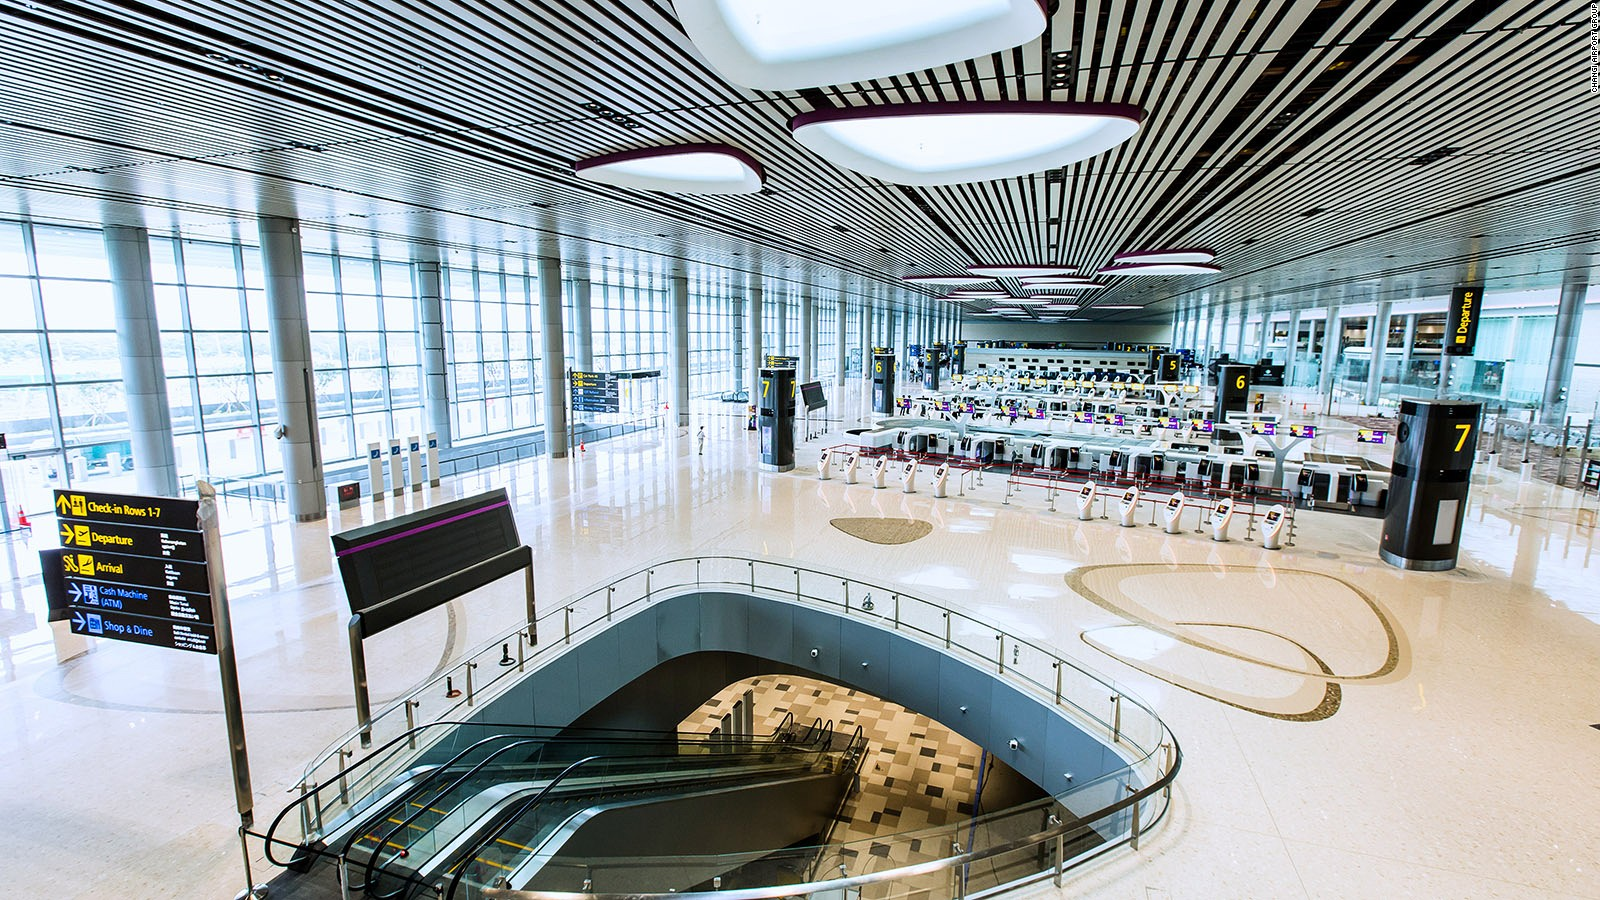 Singapore Changi Airports new terminal is dazzling CNN Travel